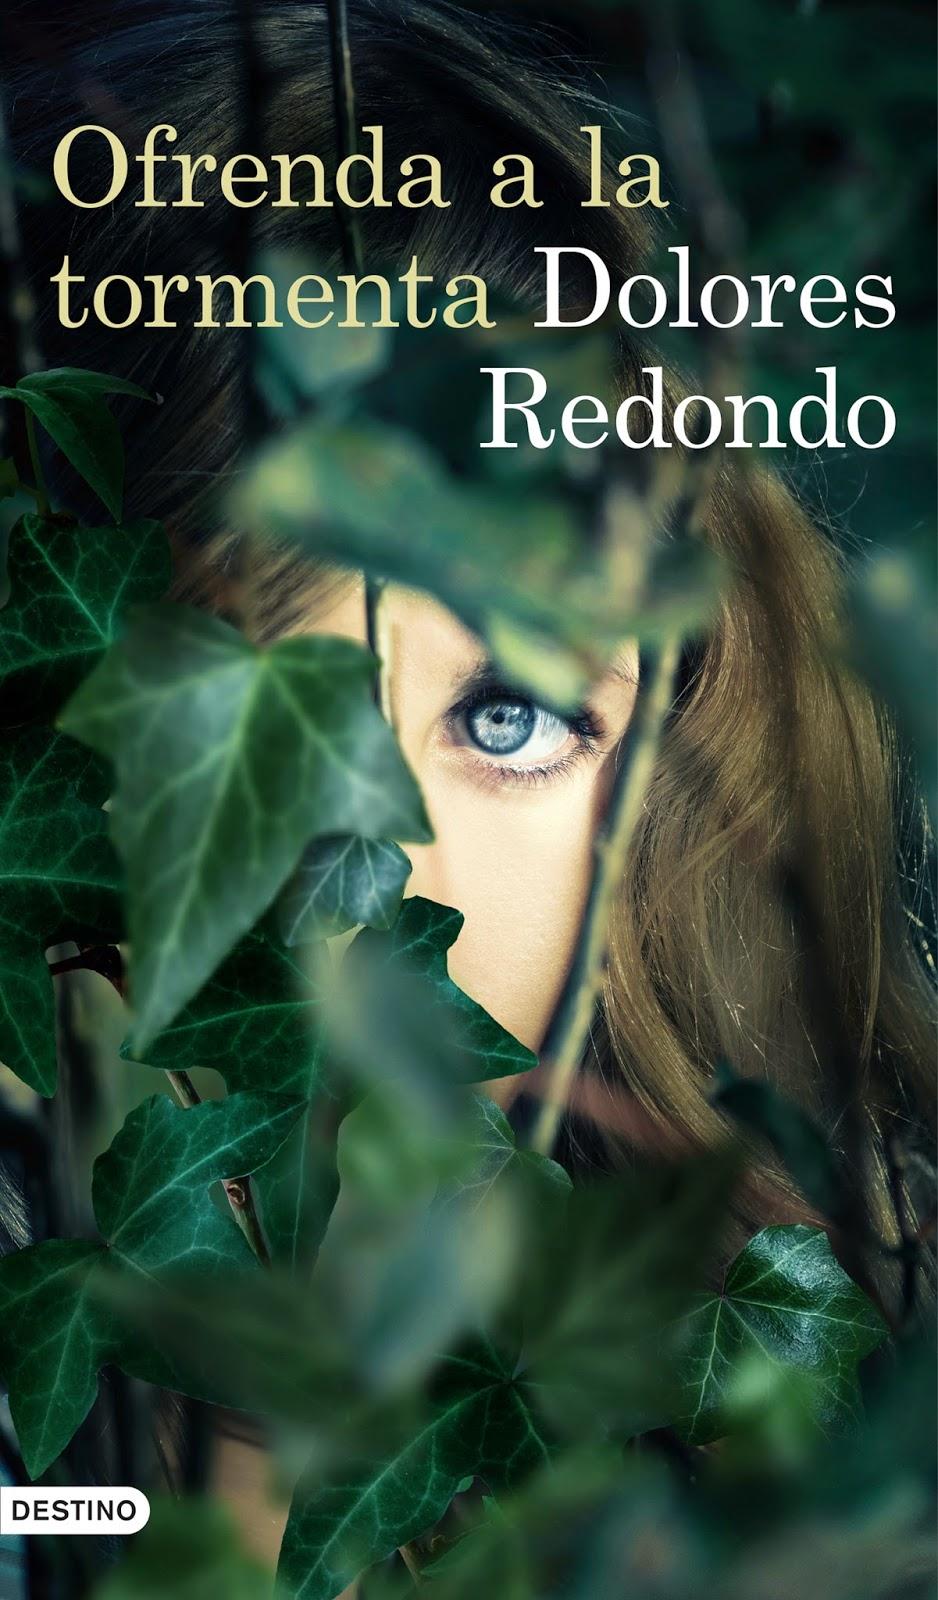 Ofrenda a la tormenta - Dolores Redondo (2014)